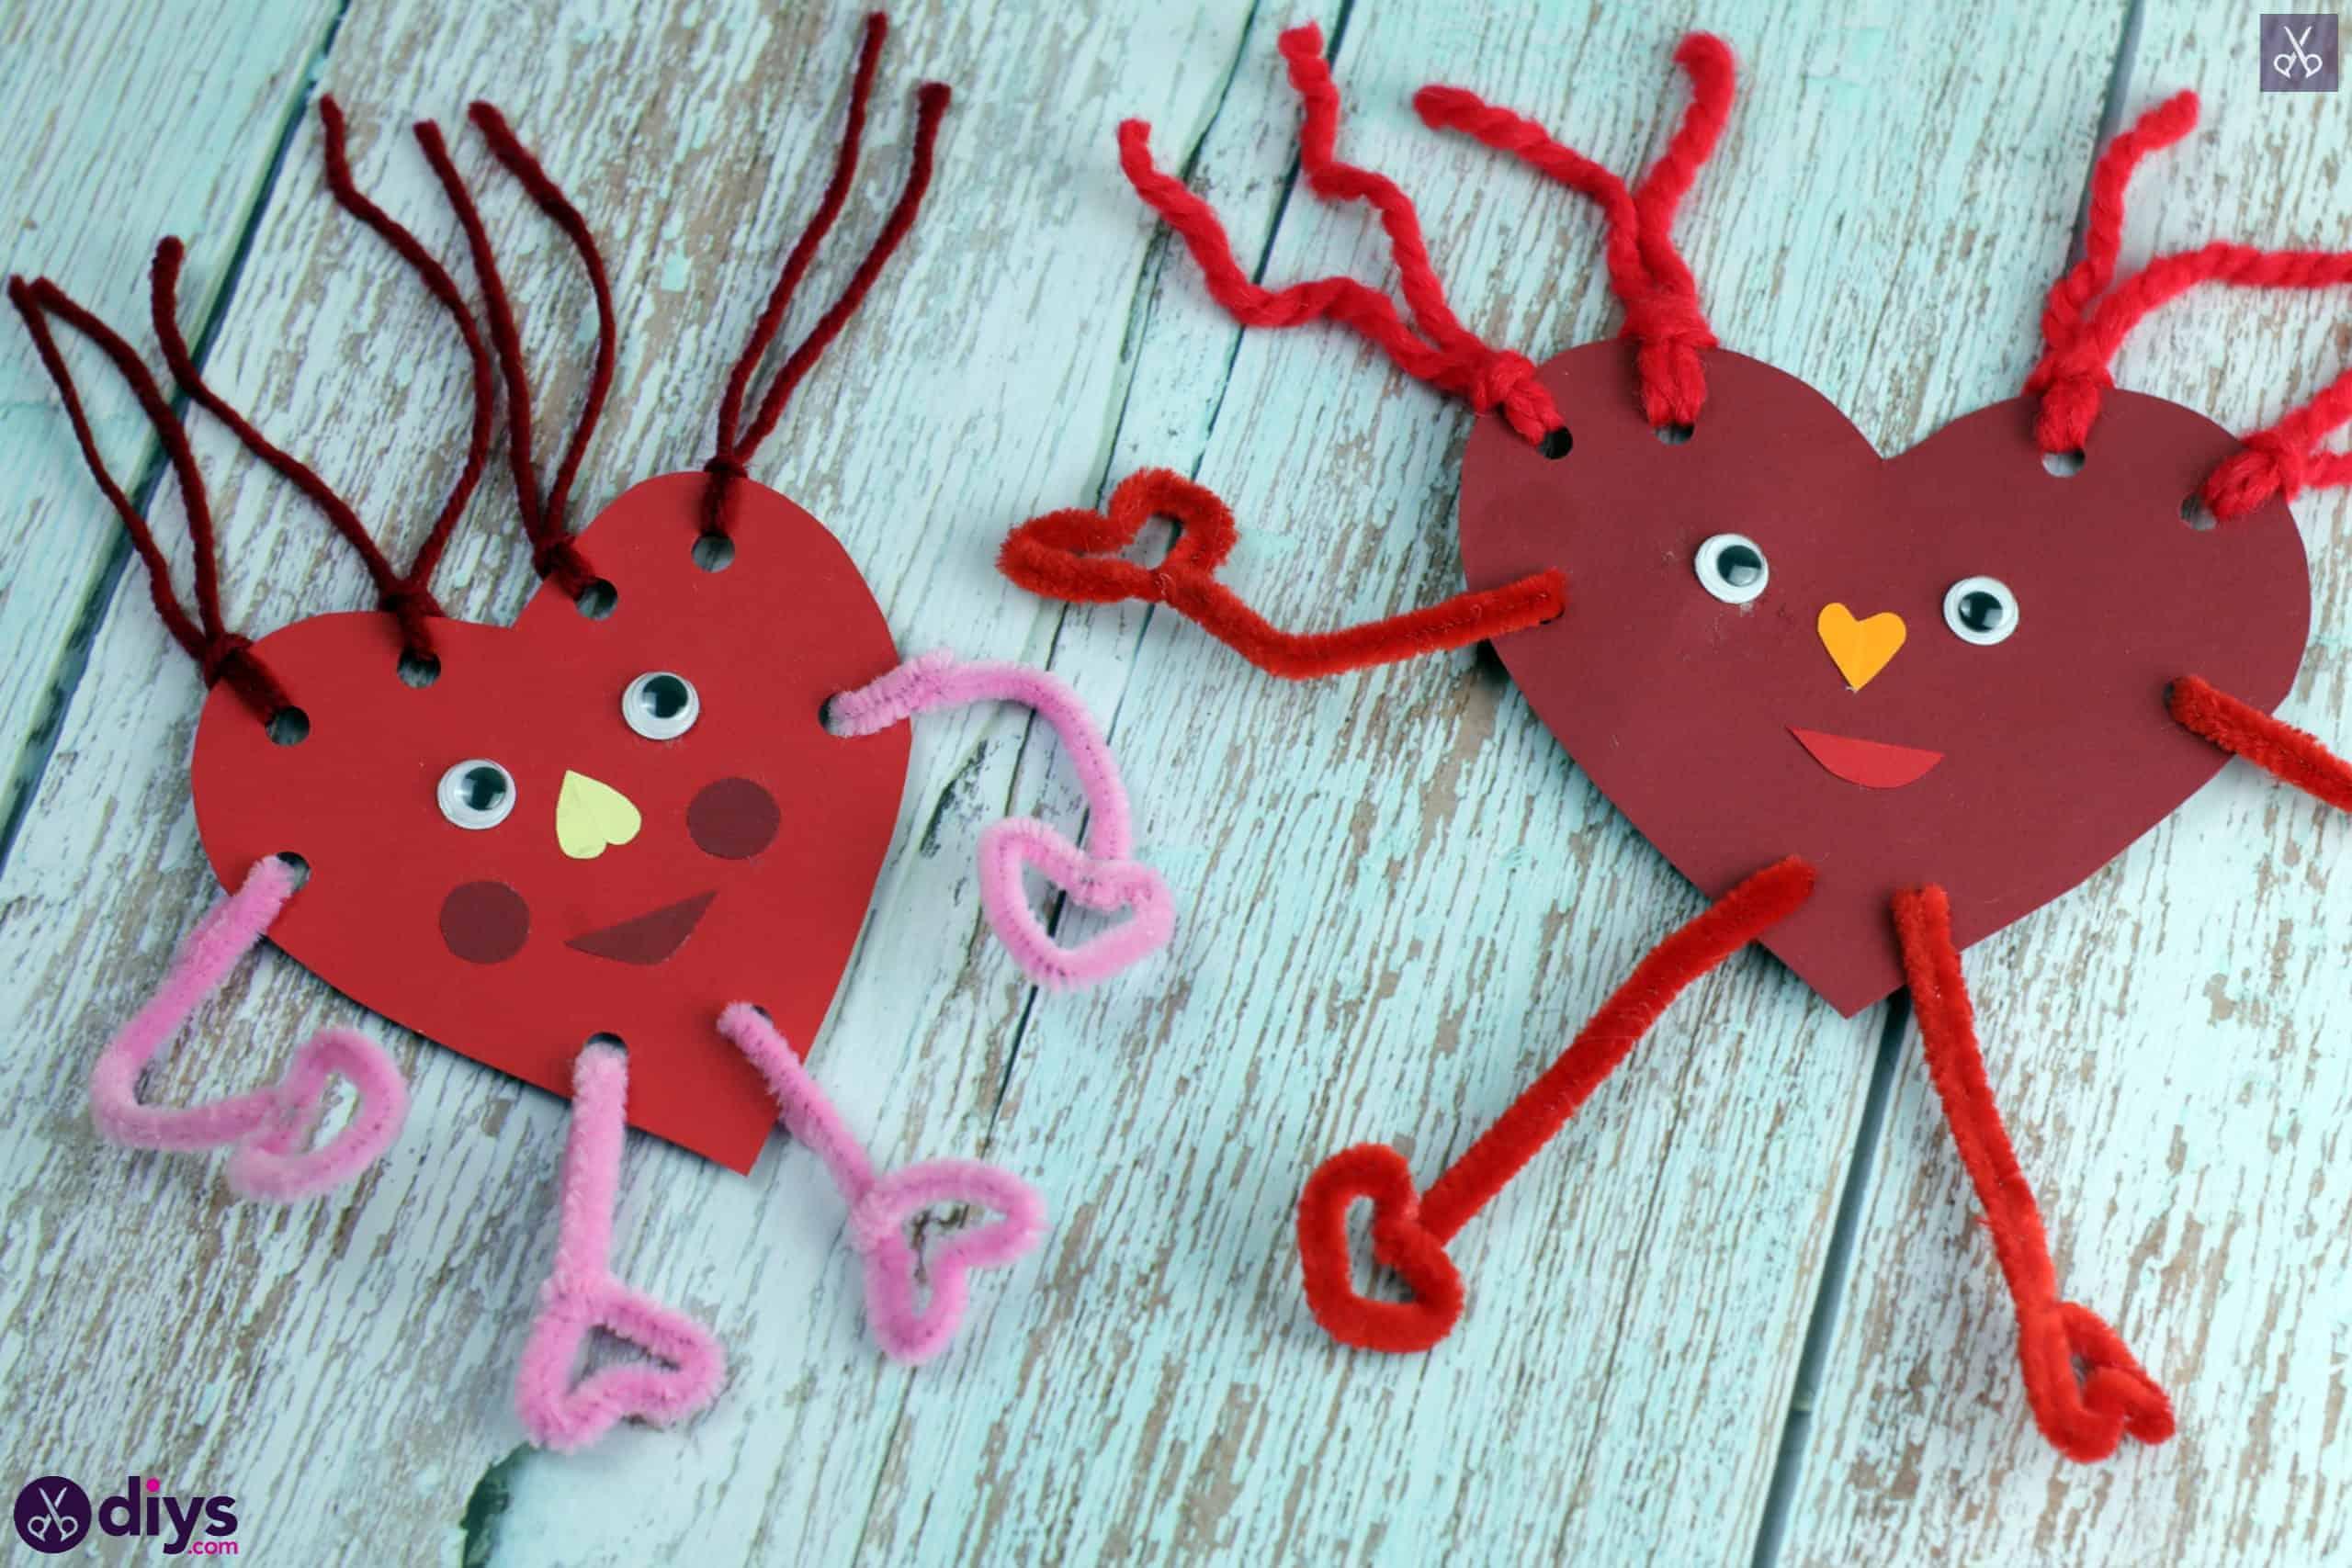 Paper valentine creature diy for kids